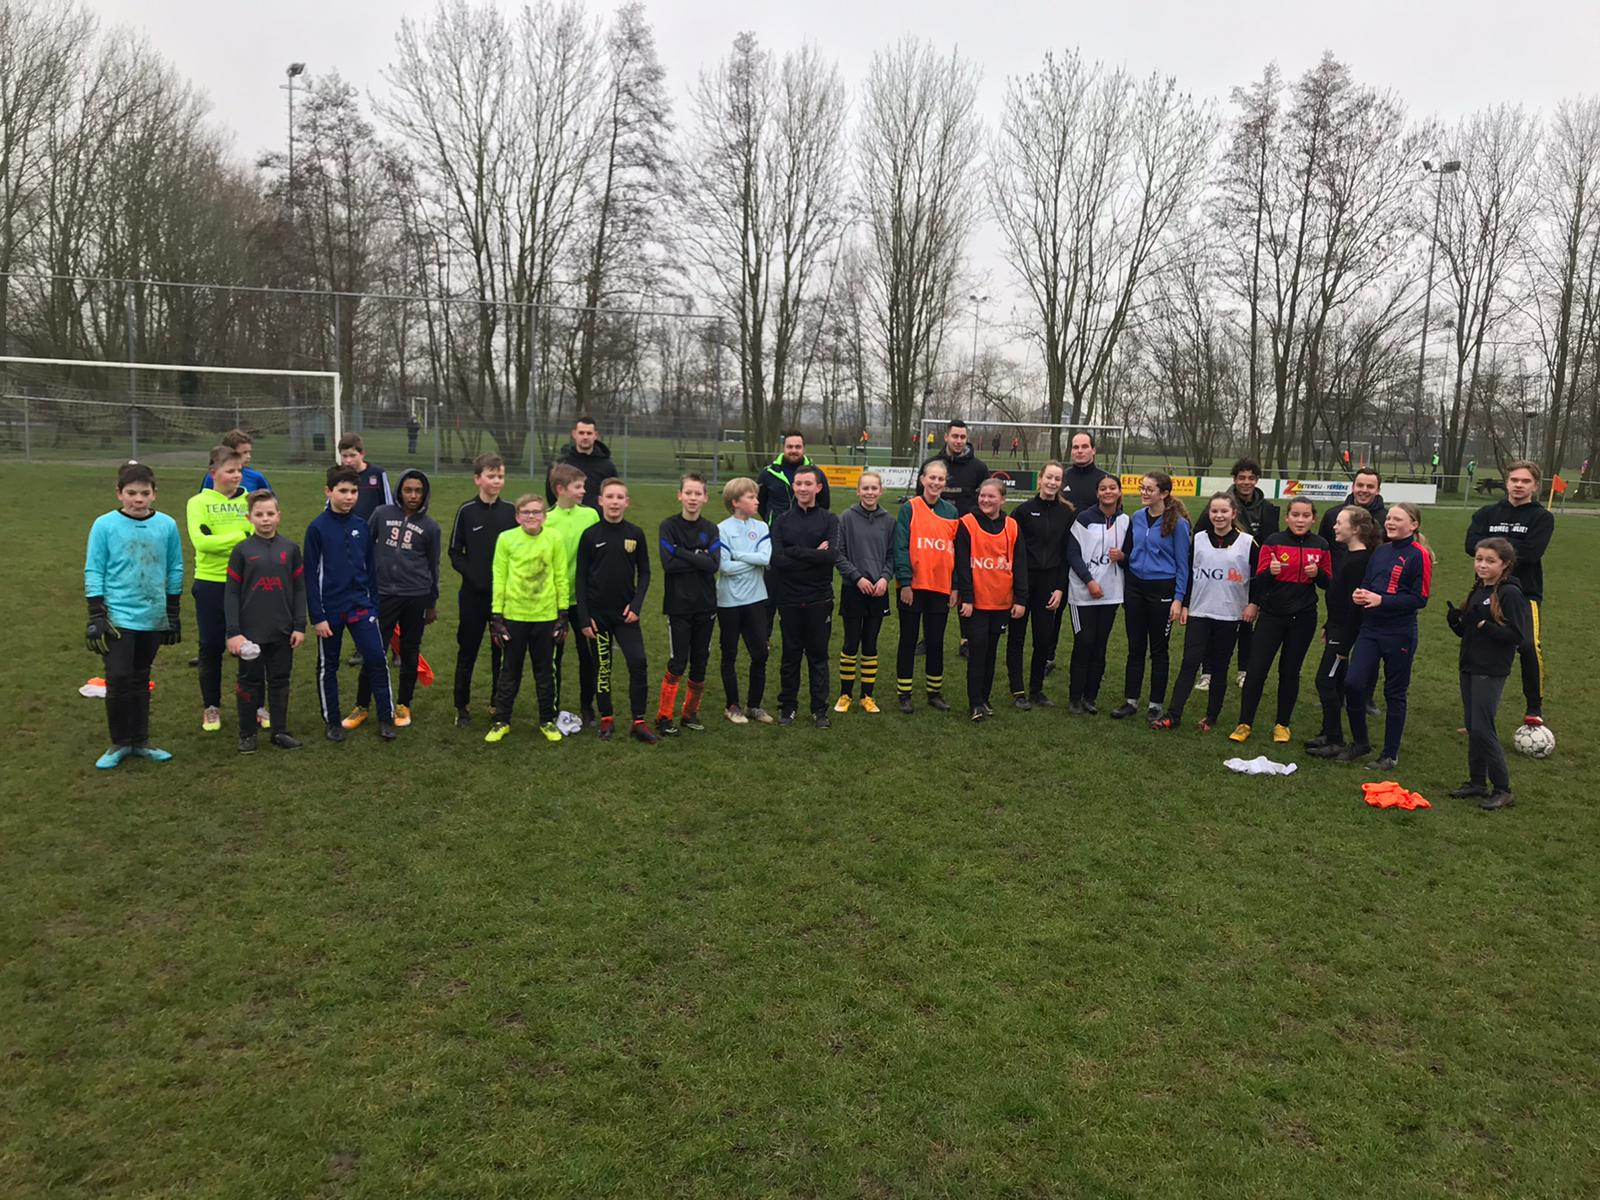 1e selectie bezorgt jeugd VV Kruiningen een topochtend!